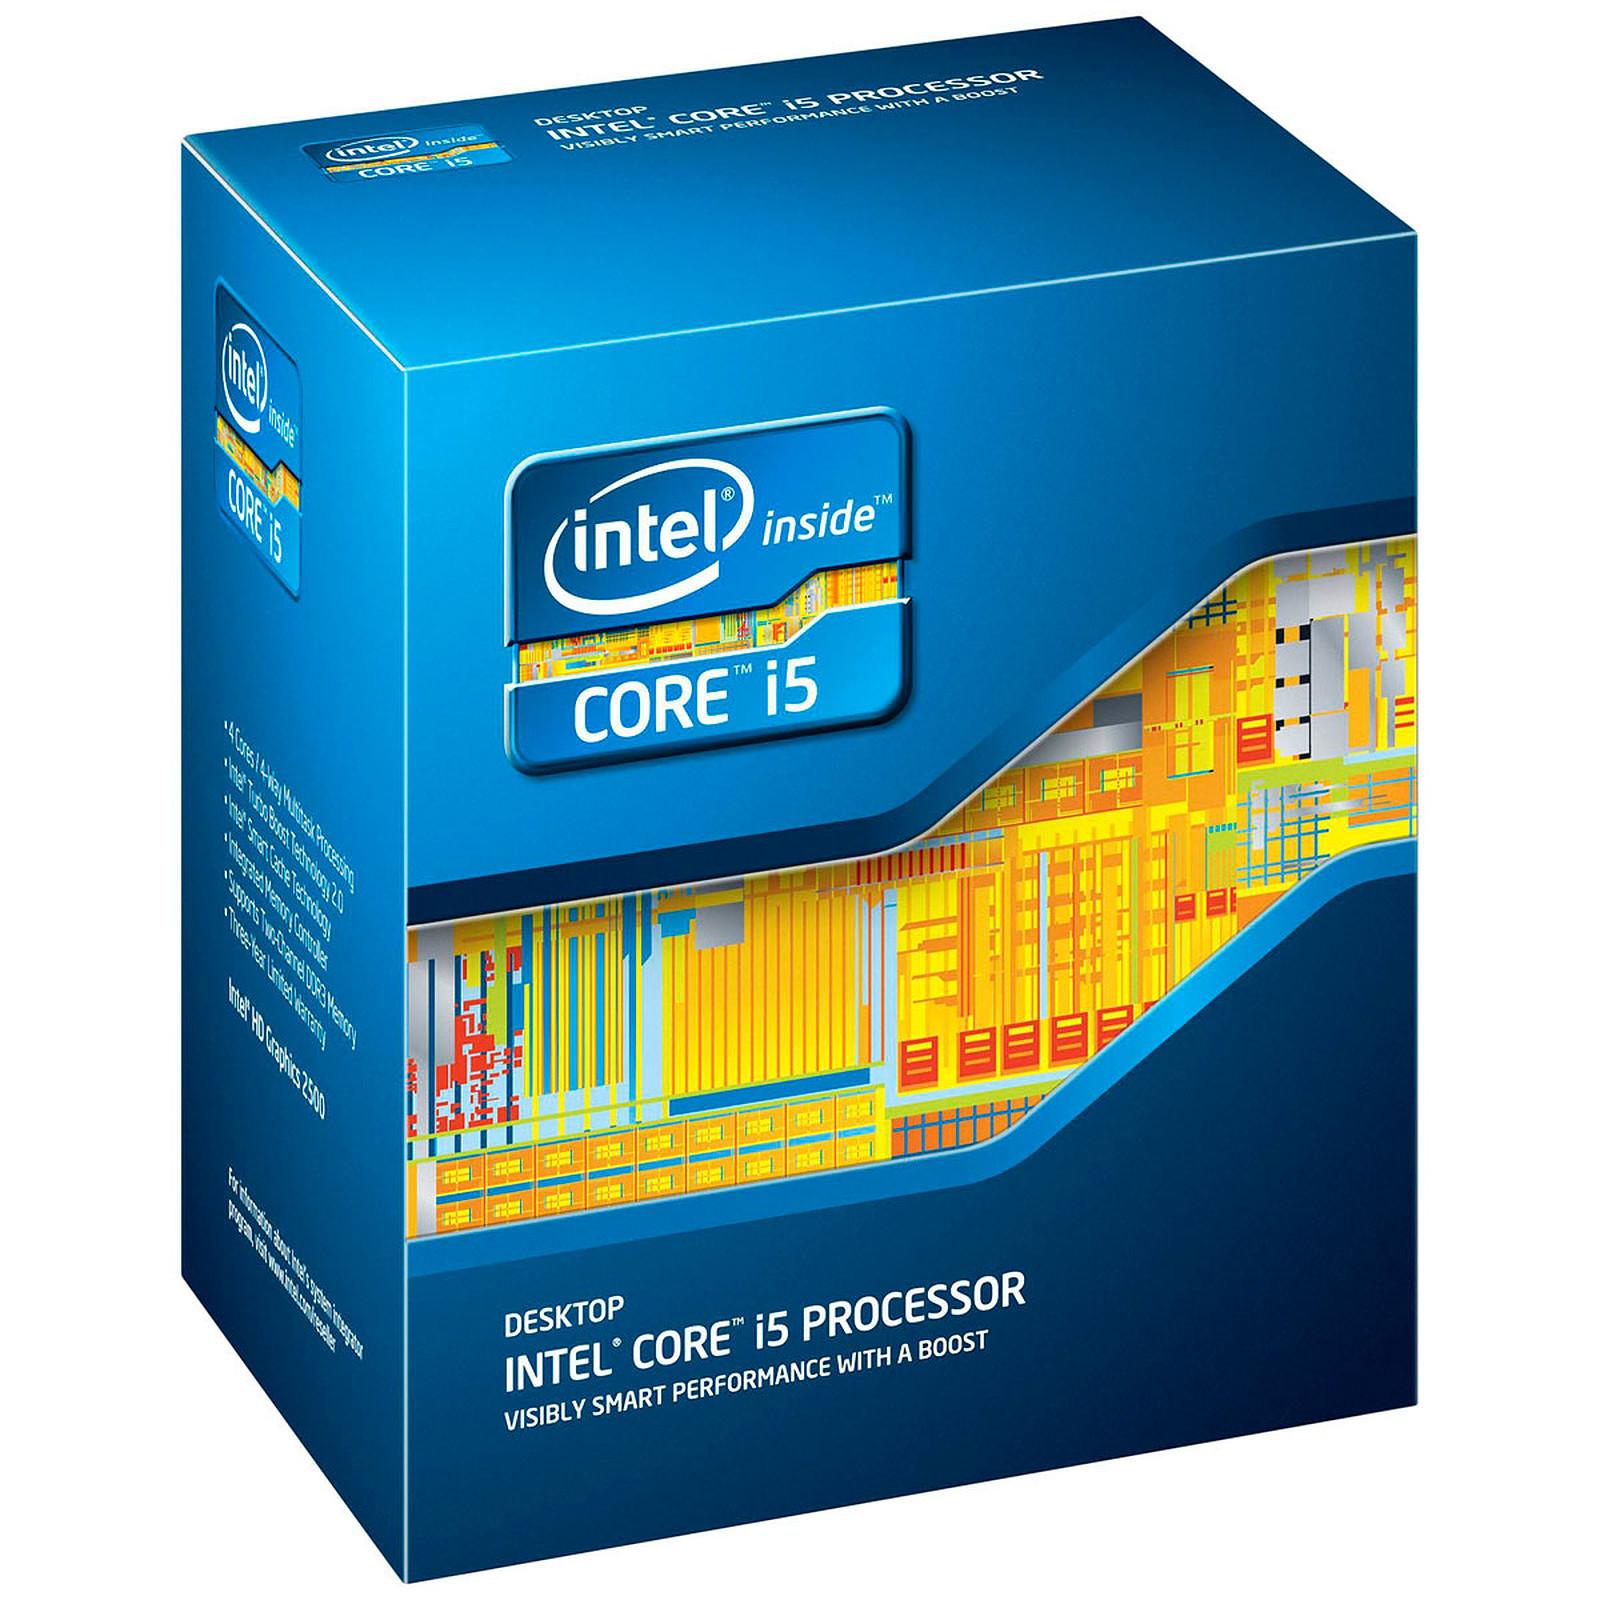 Intel Core i5-3470S (2.9 GHz)